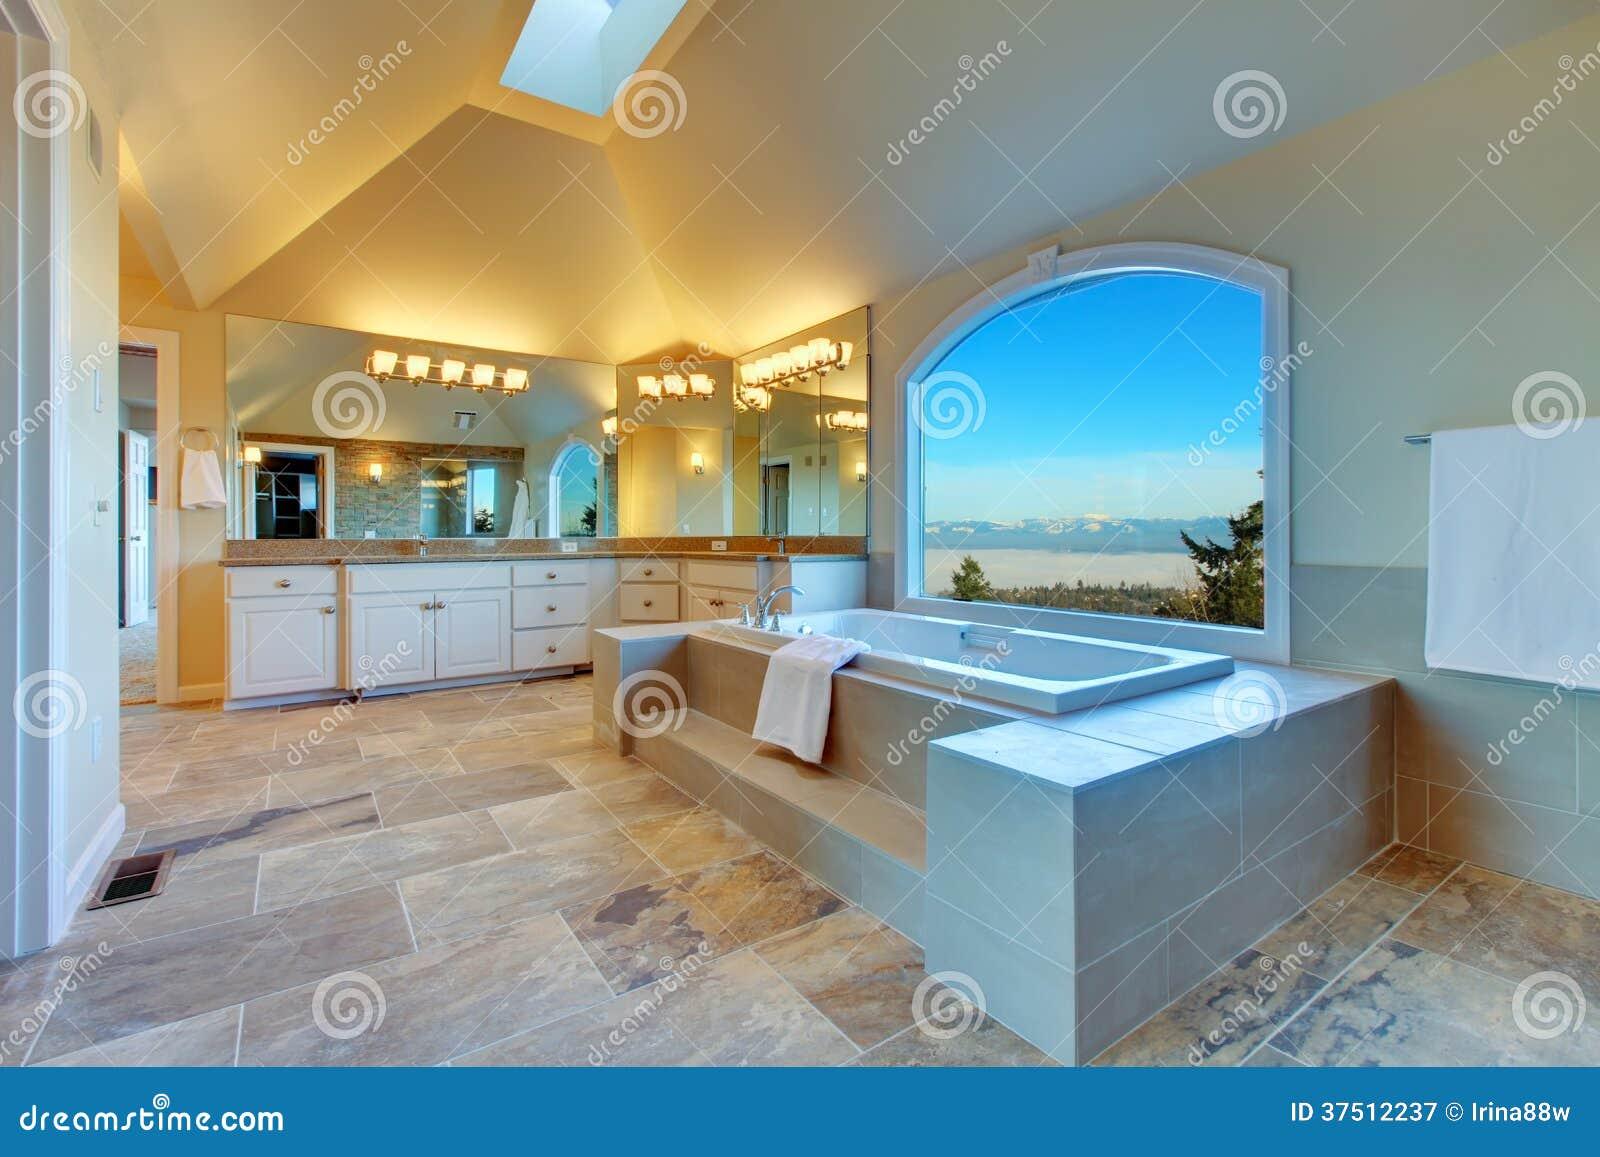 Luxuriant Bathroom With Whirlpool And Amazing Window View Royalty Free  #068EC5 1300x957 Banheiro Com Banheira Integrada